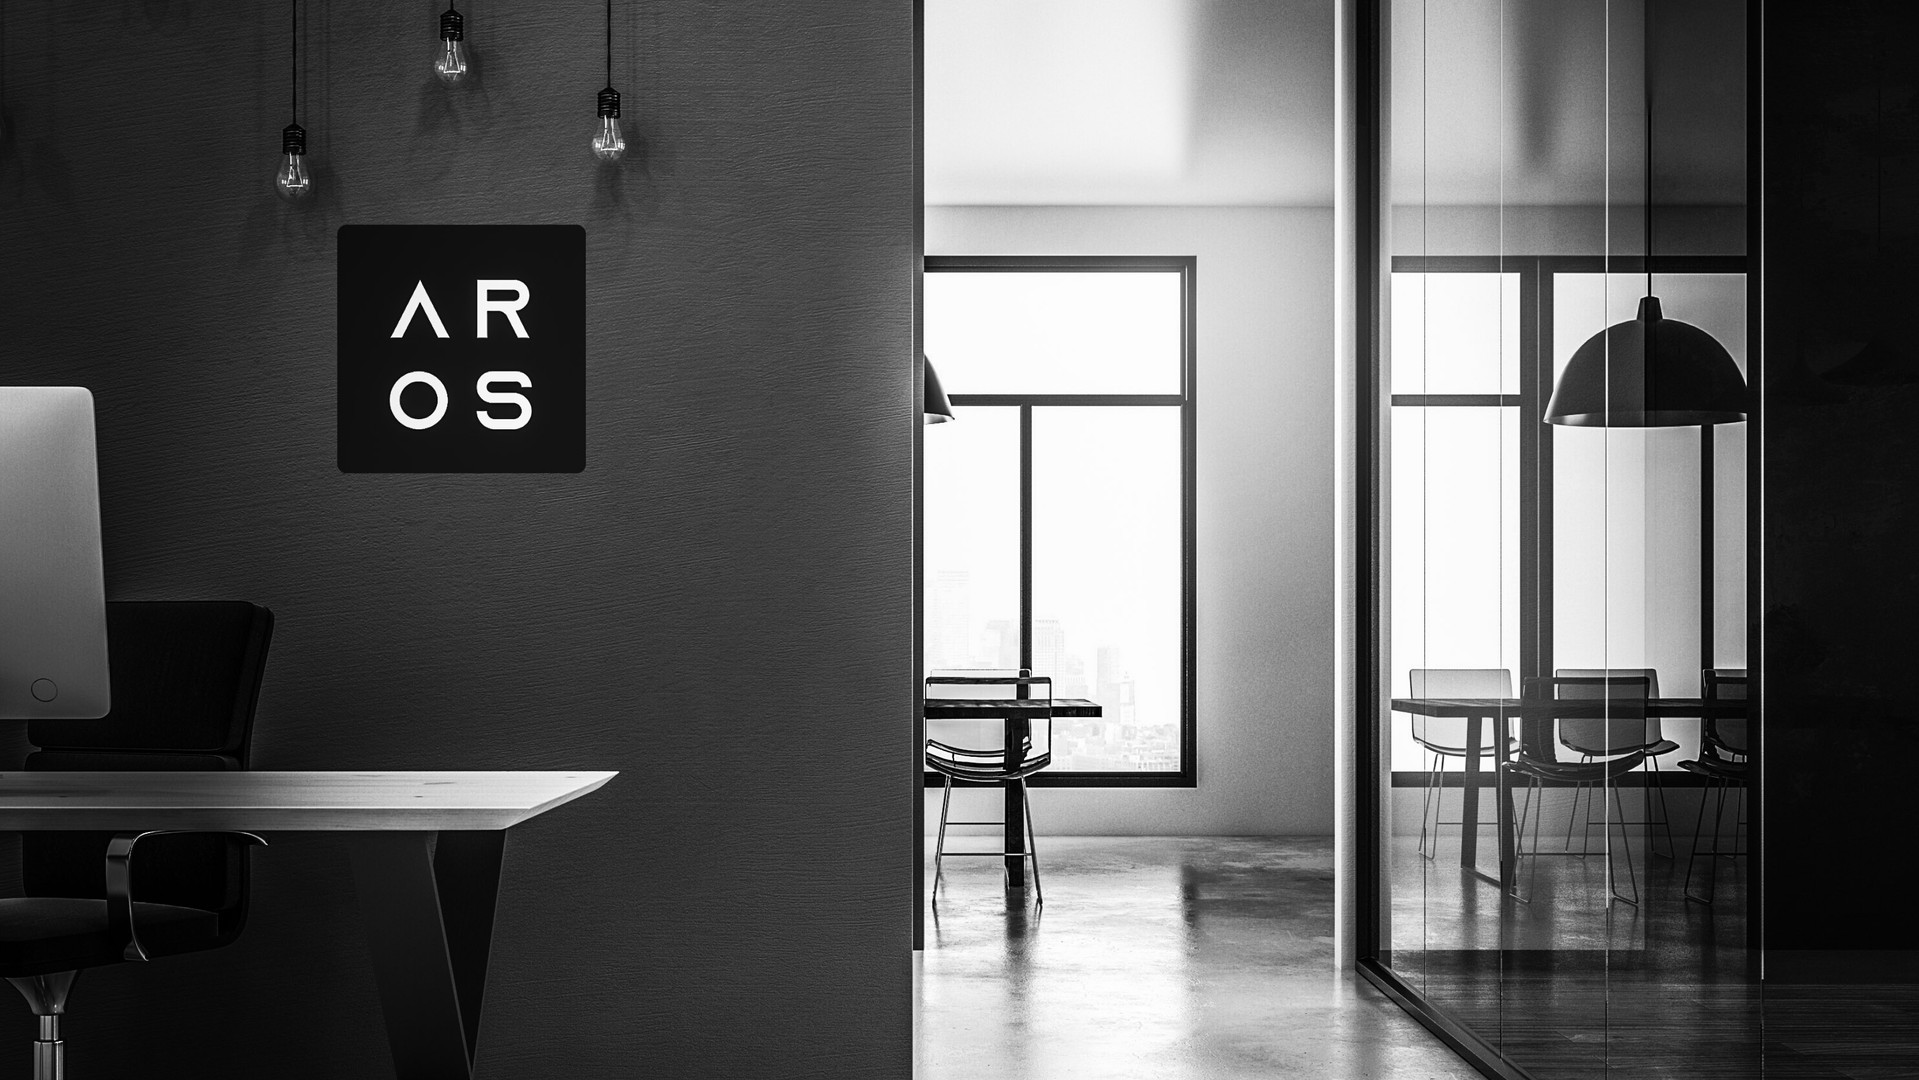 ARoS work space